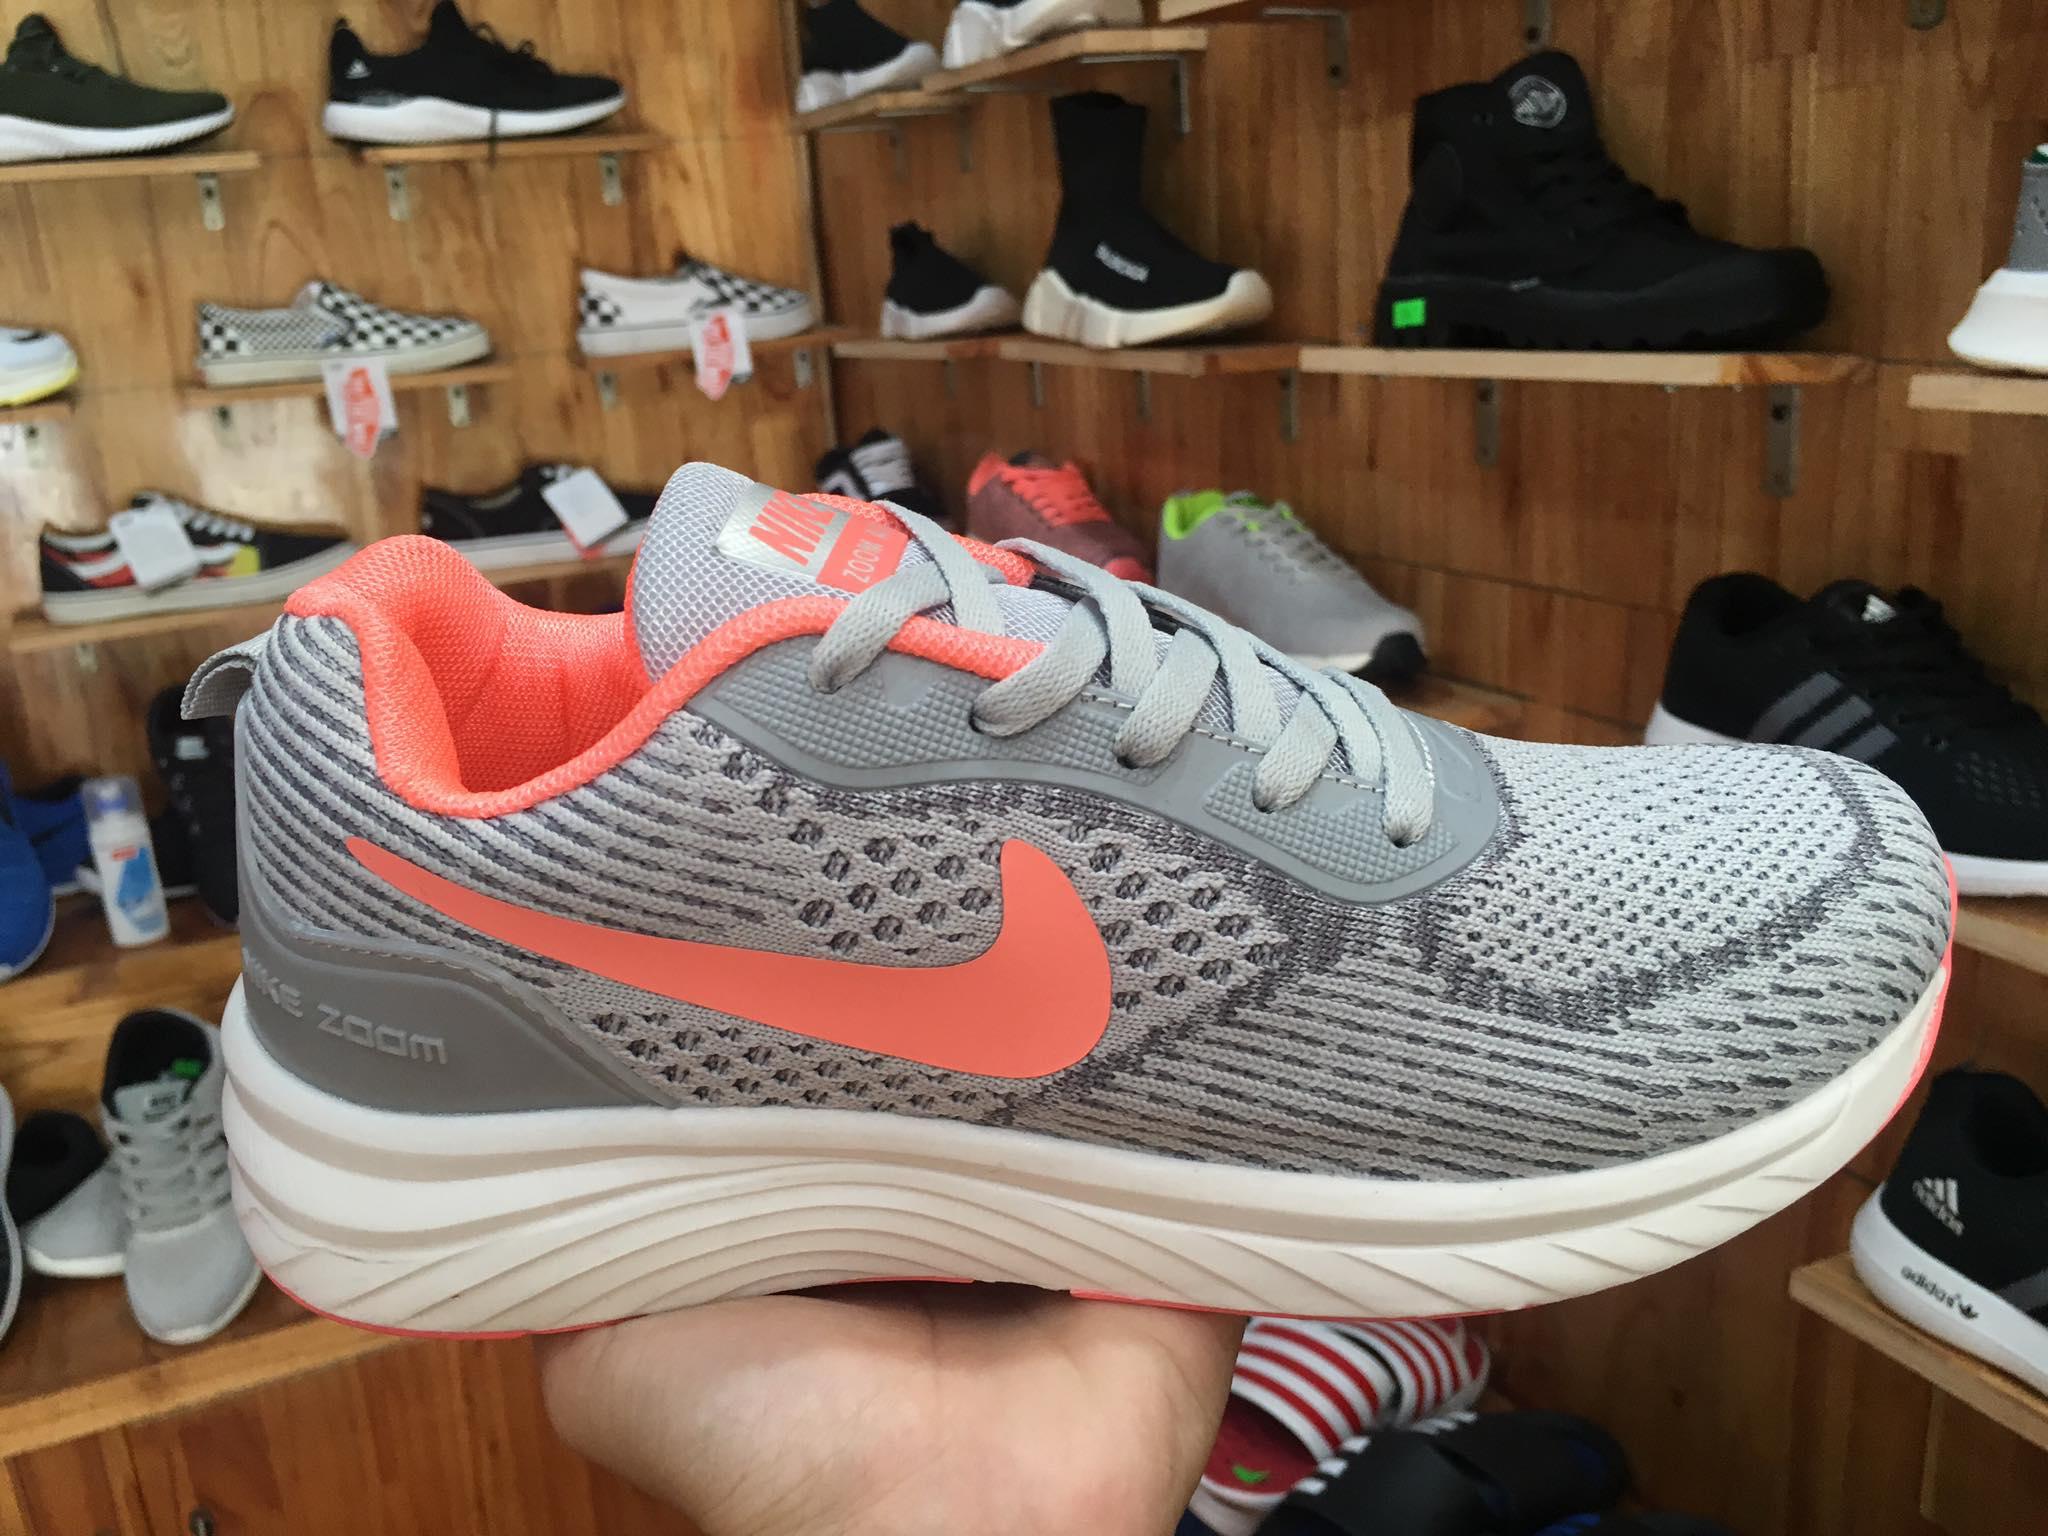 Giày Nike zoom air xám cam